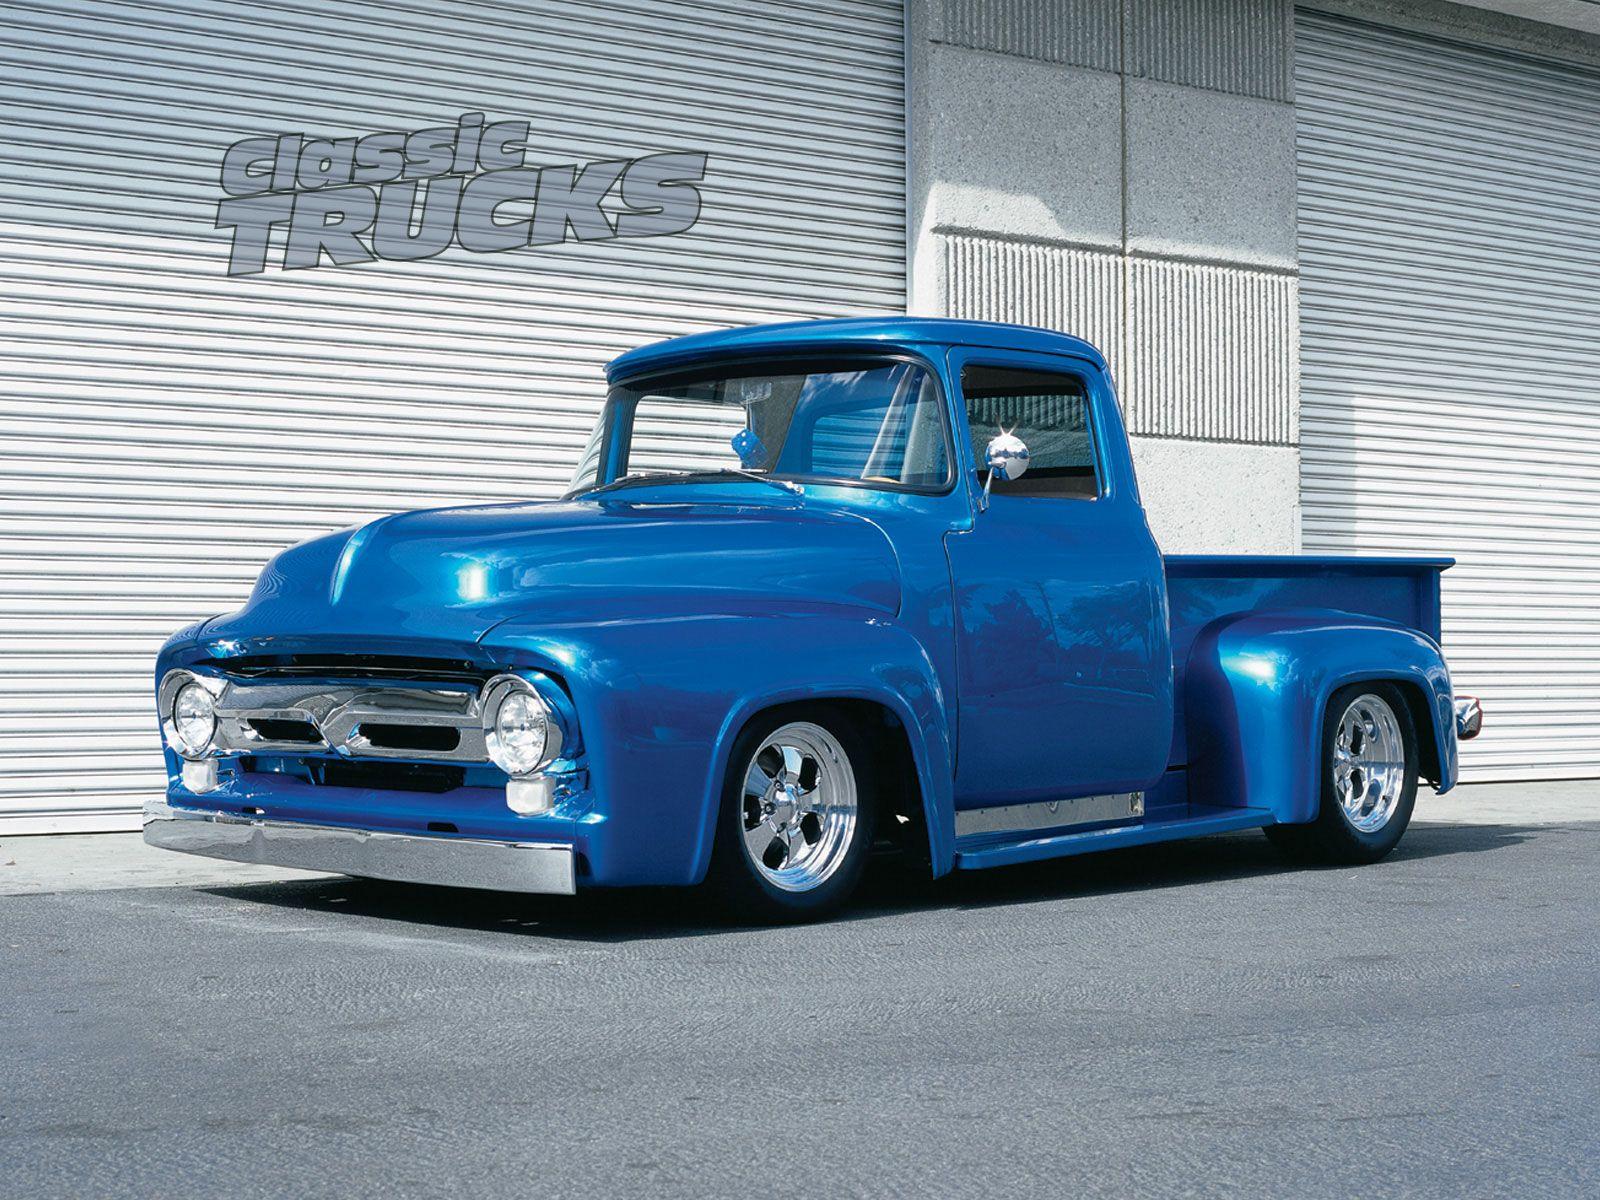 Ford F150 [Desktop wallpaper 1600x1200] Trucks Etc Desktop Wps 1600x1200